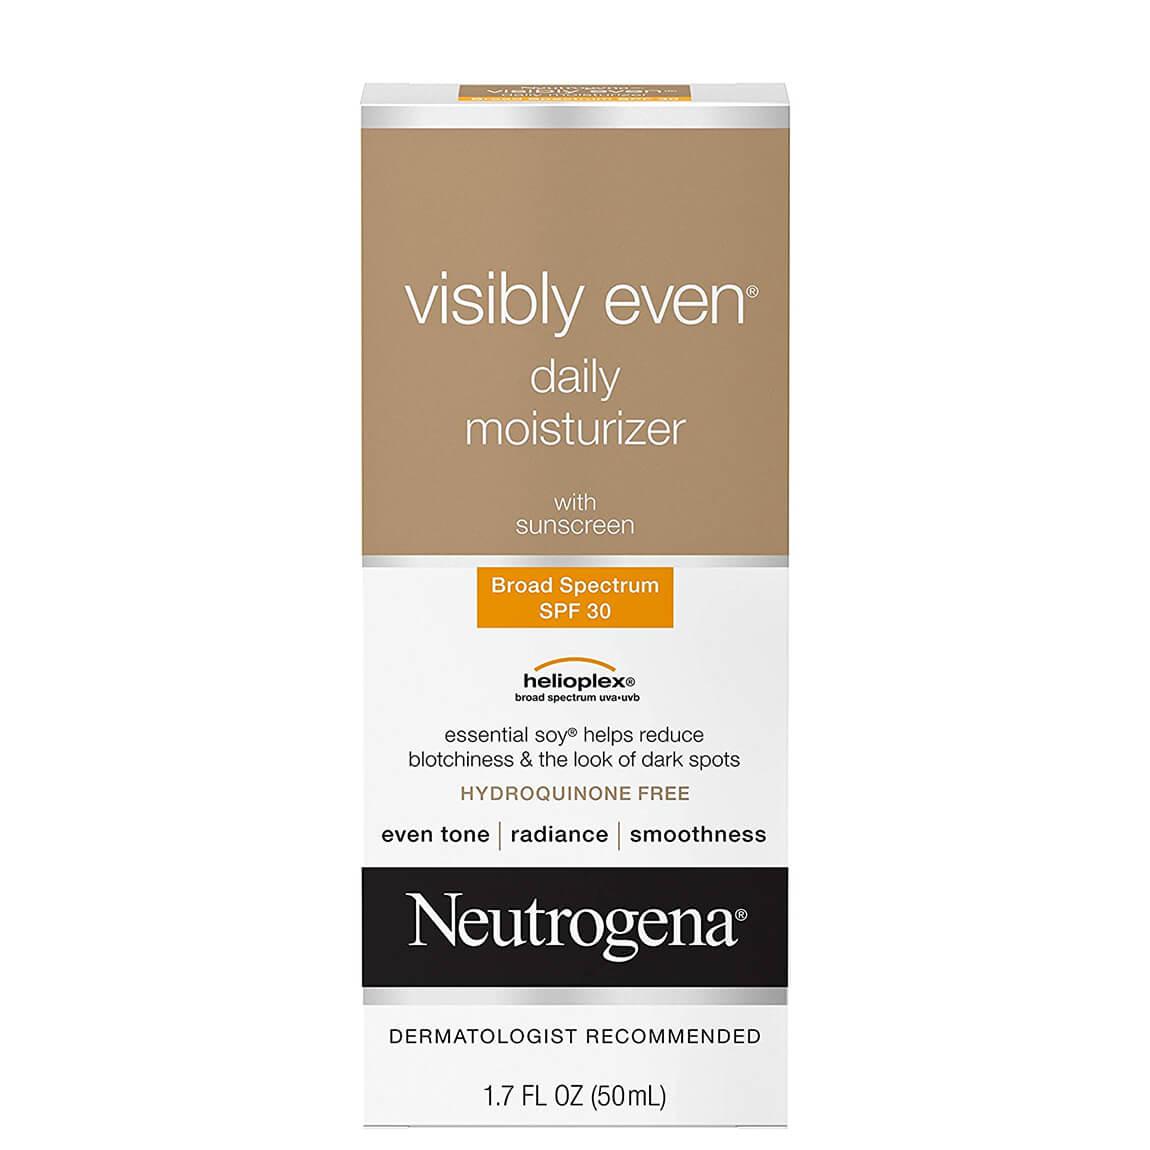 Neutrogena Visibly Even Daily Moisturizer with Sunscreen SPF30 50ml